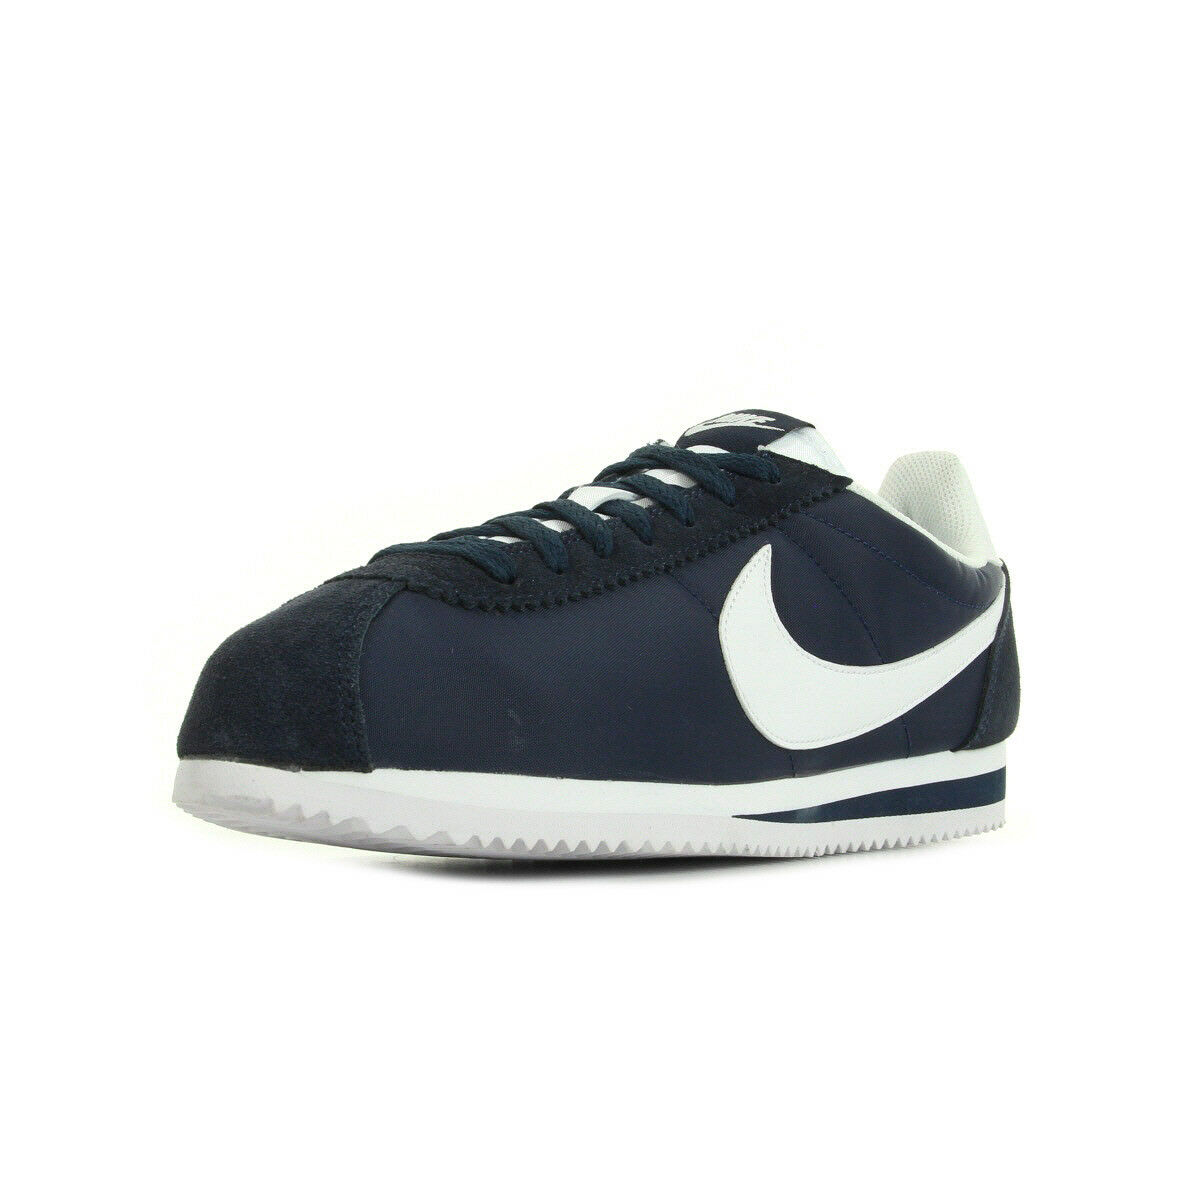 Nylon Chaussures Marine Classic Cortez Baskets Taille Nike Unisexe xSz16p